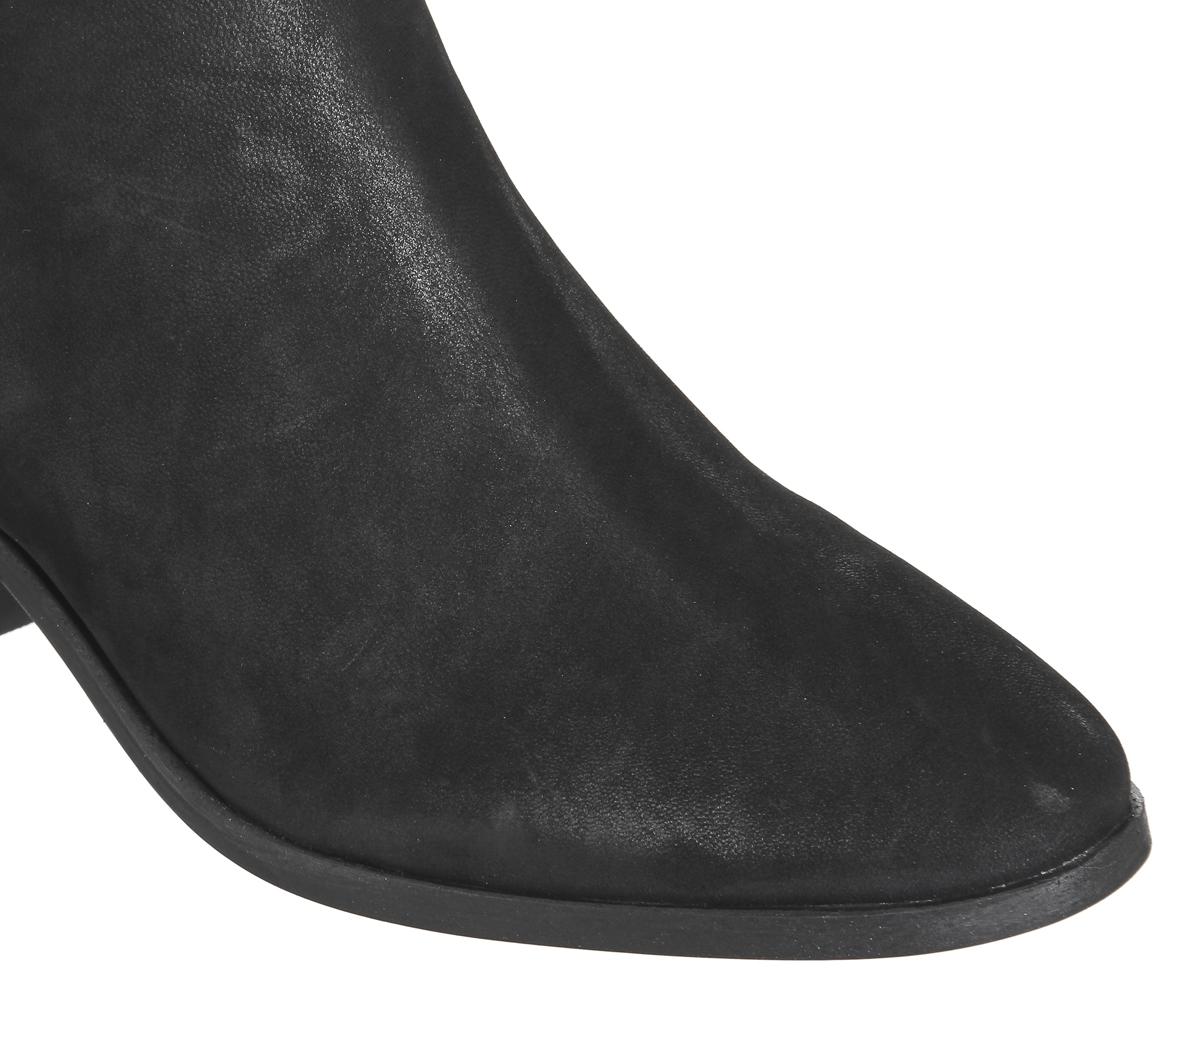 Damenschuhe BLACK Office Animate Chelsea Stiefel BLACK Damenschuhe NUBUCK Stiefel a7bc89